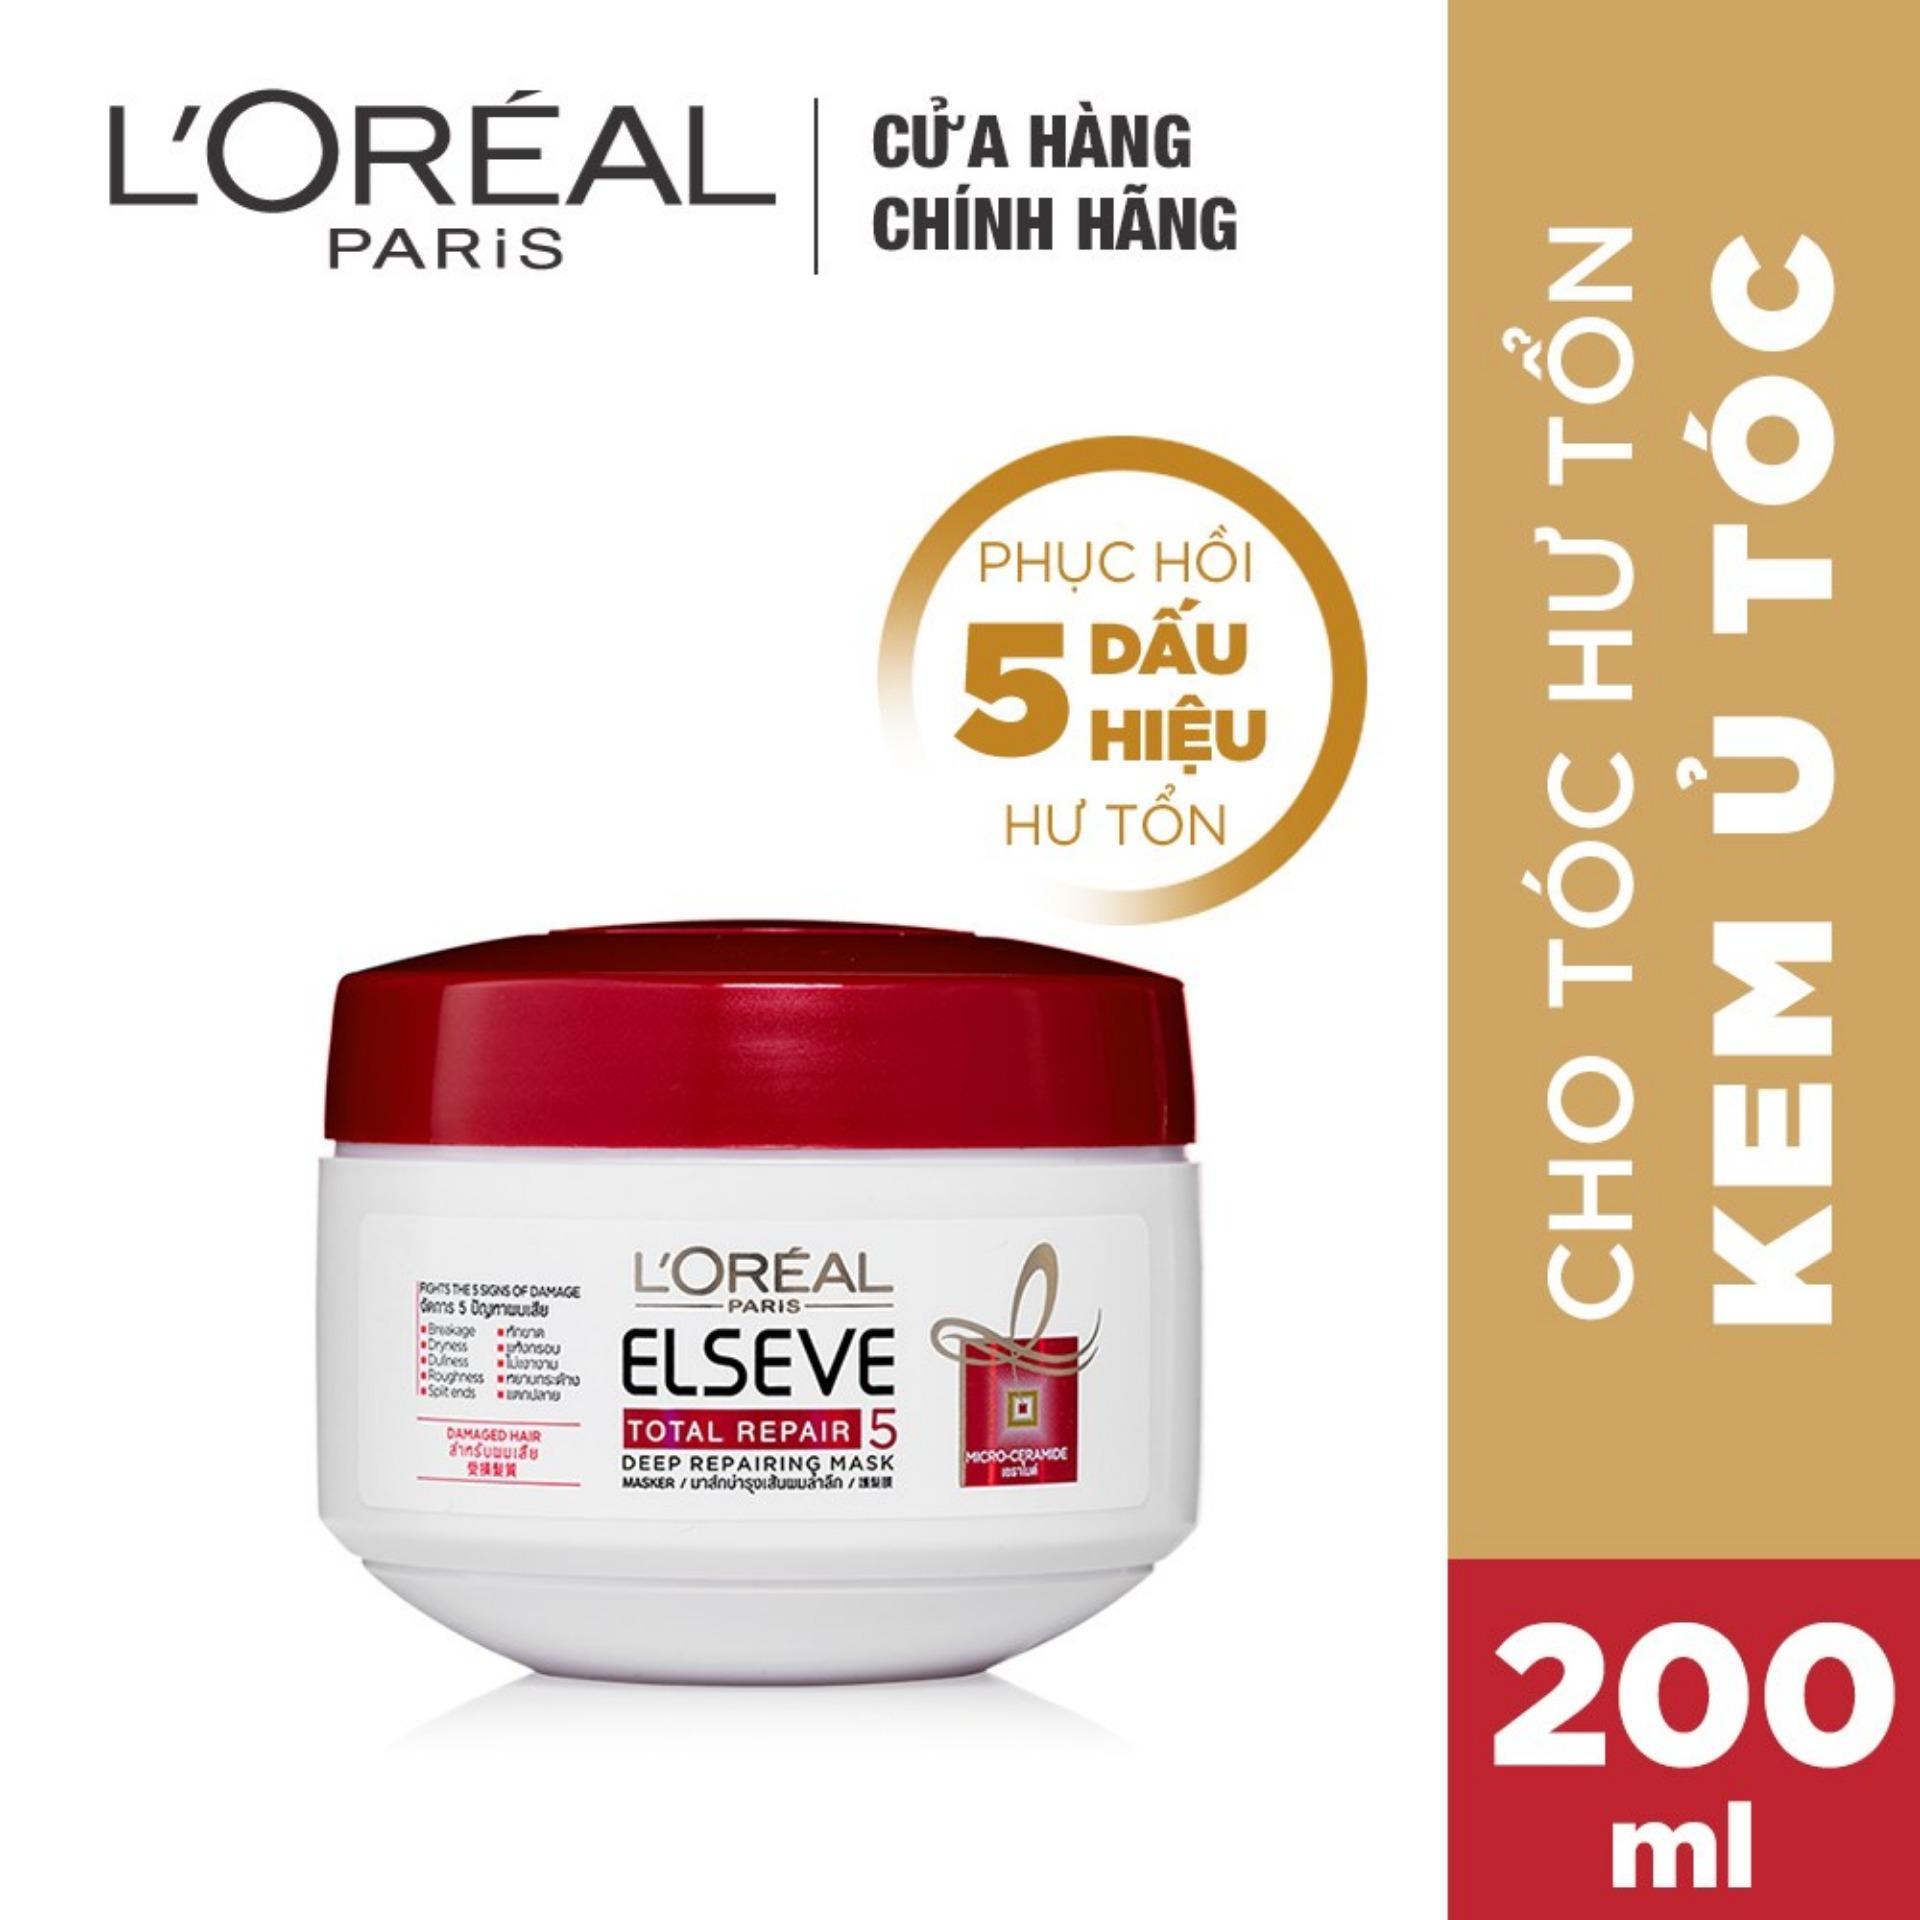 Kem ủ phục hồi tóc LOréal Paris Total Repair 5 200ml nhập khẩu